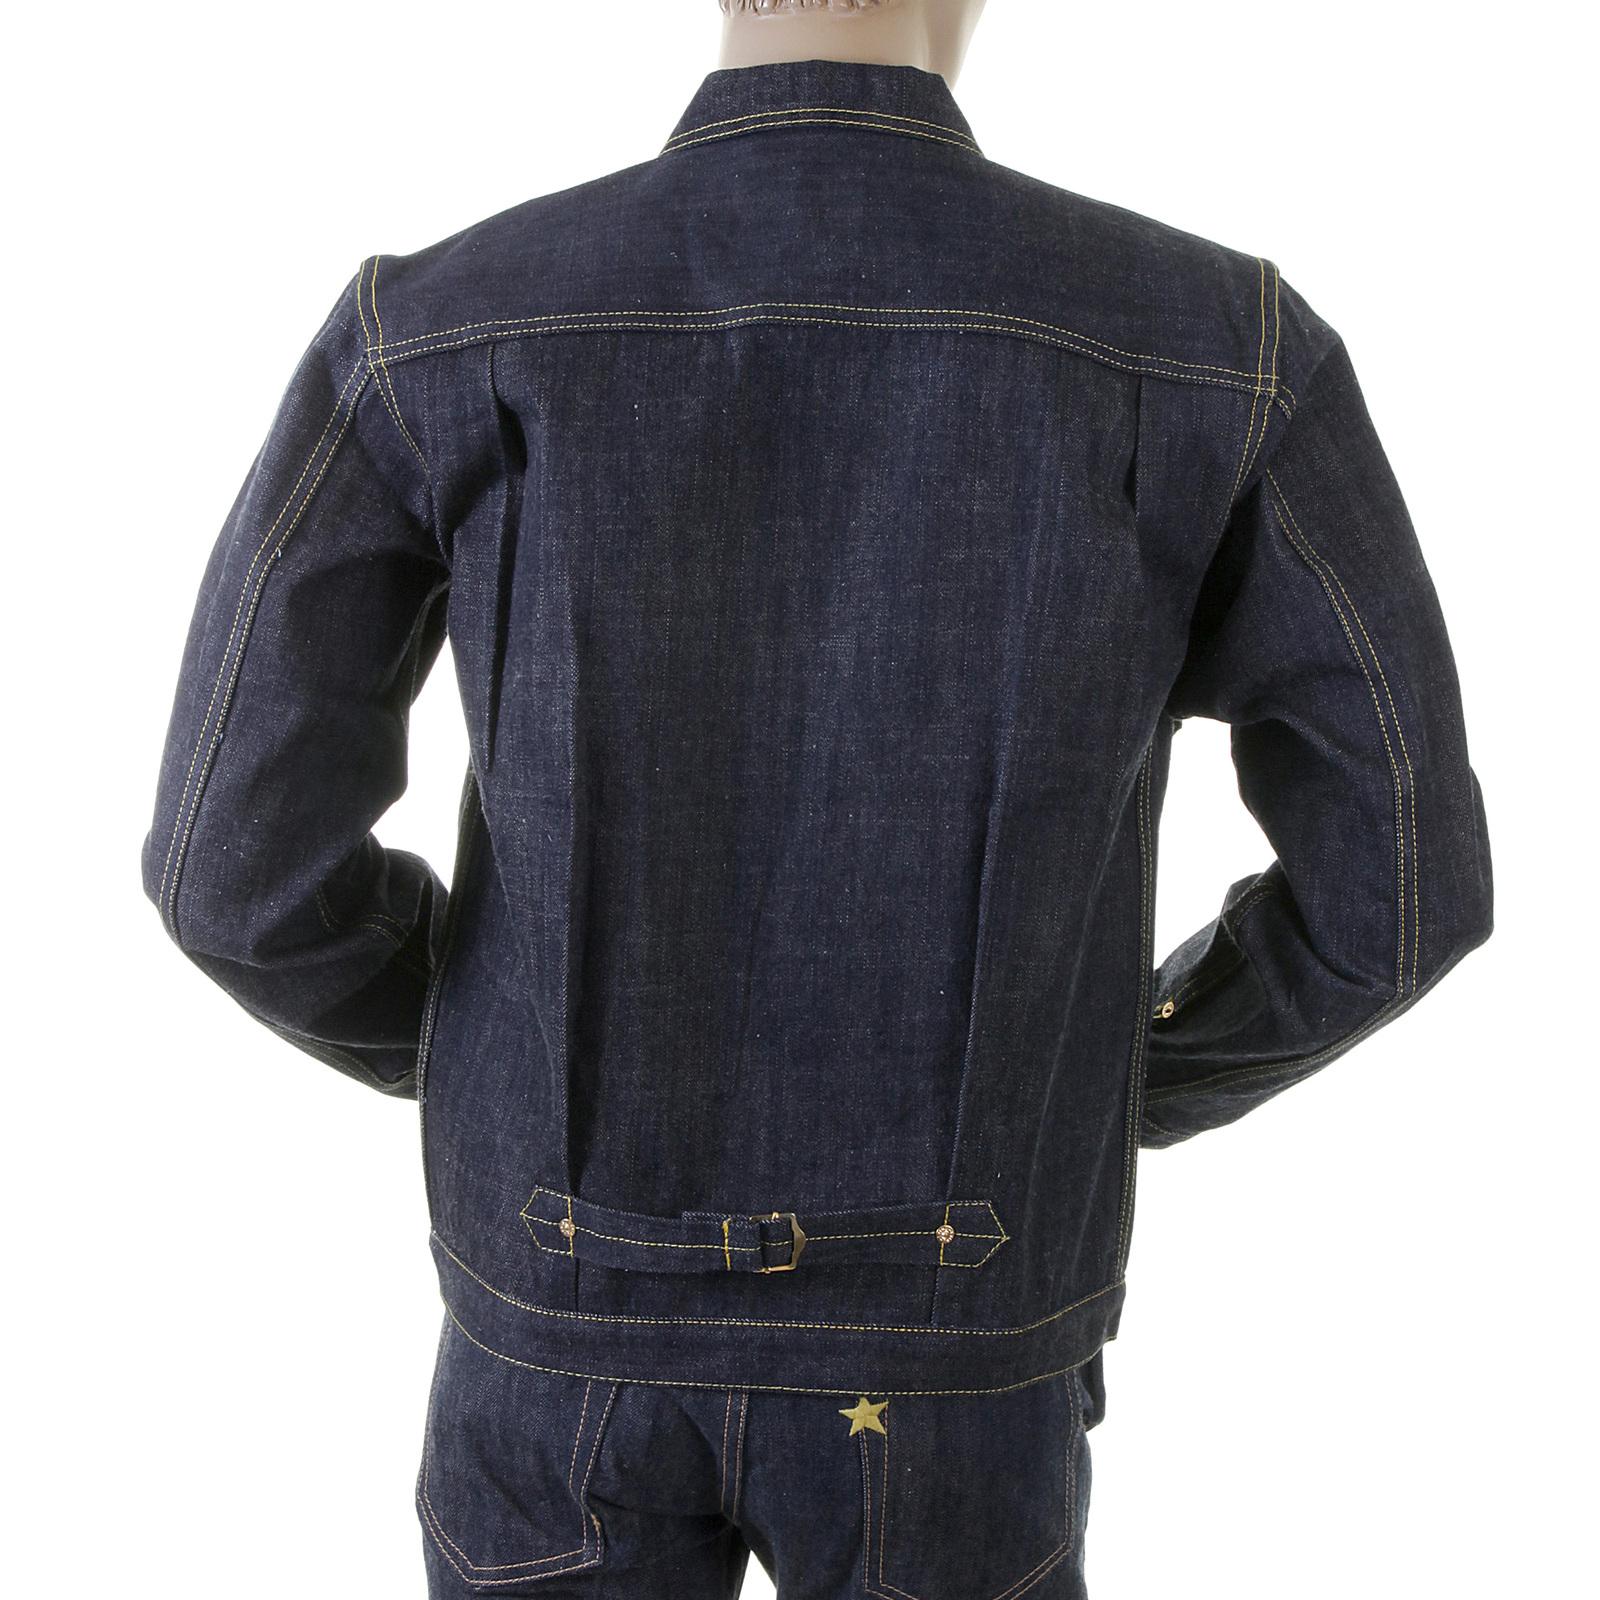 6b181688e070 Evisu Heritage Early Original Non Wash Denim Number One Special Jacket  EVIS1690